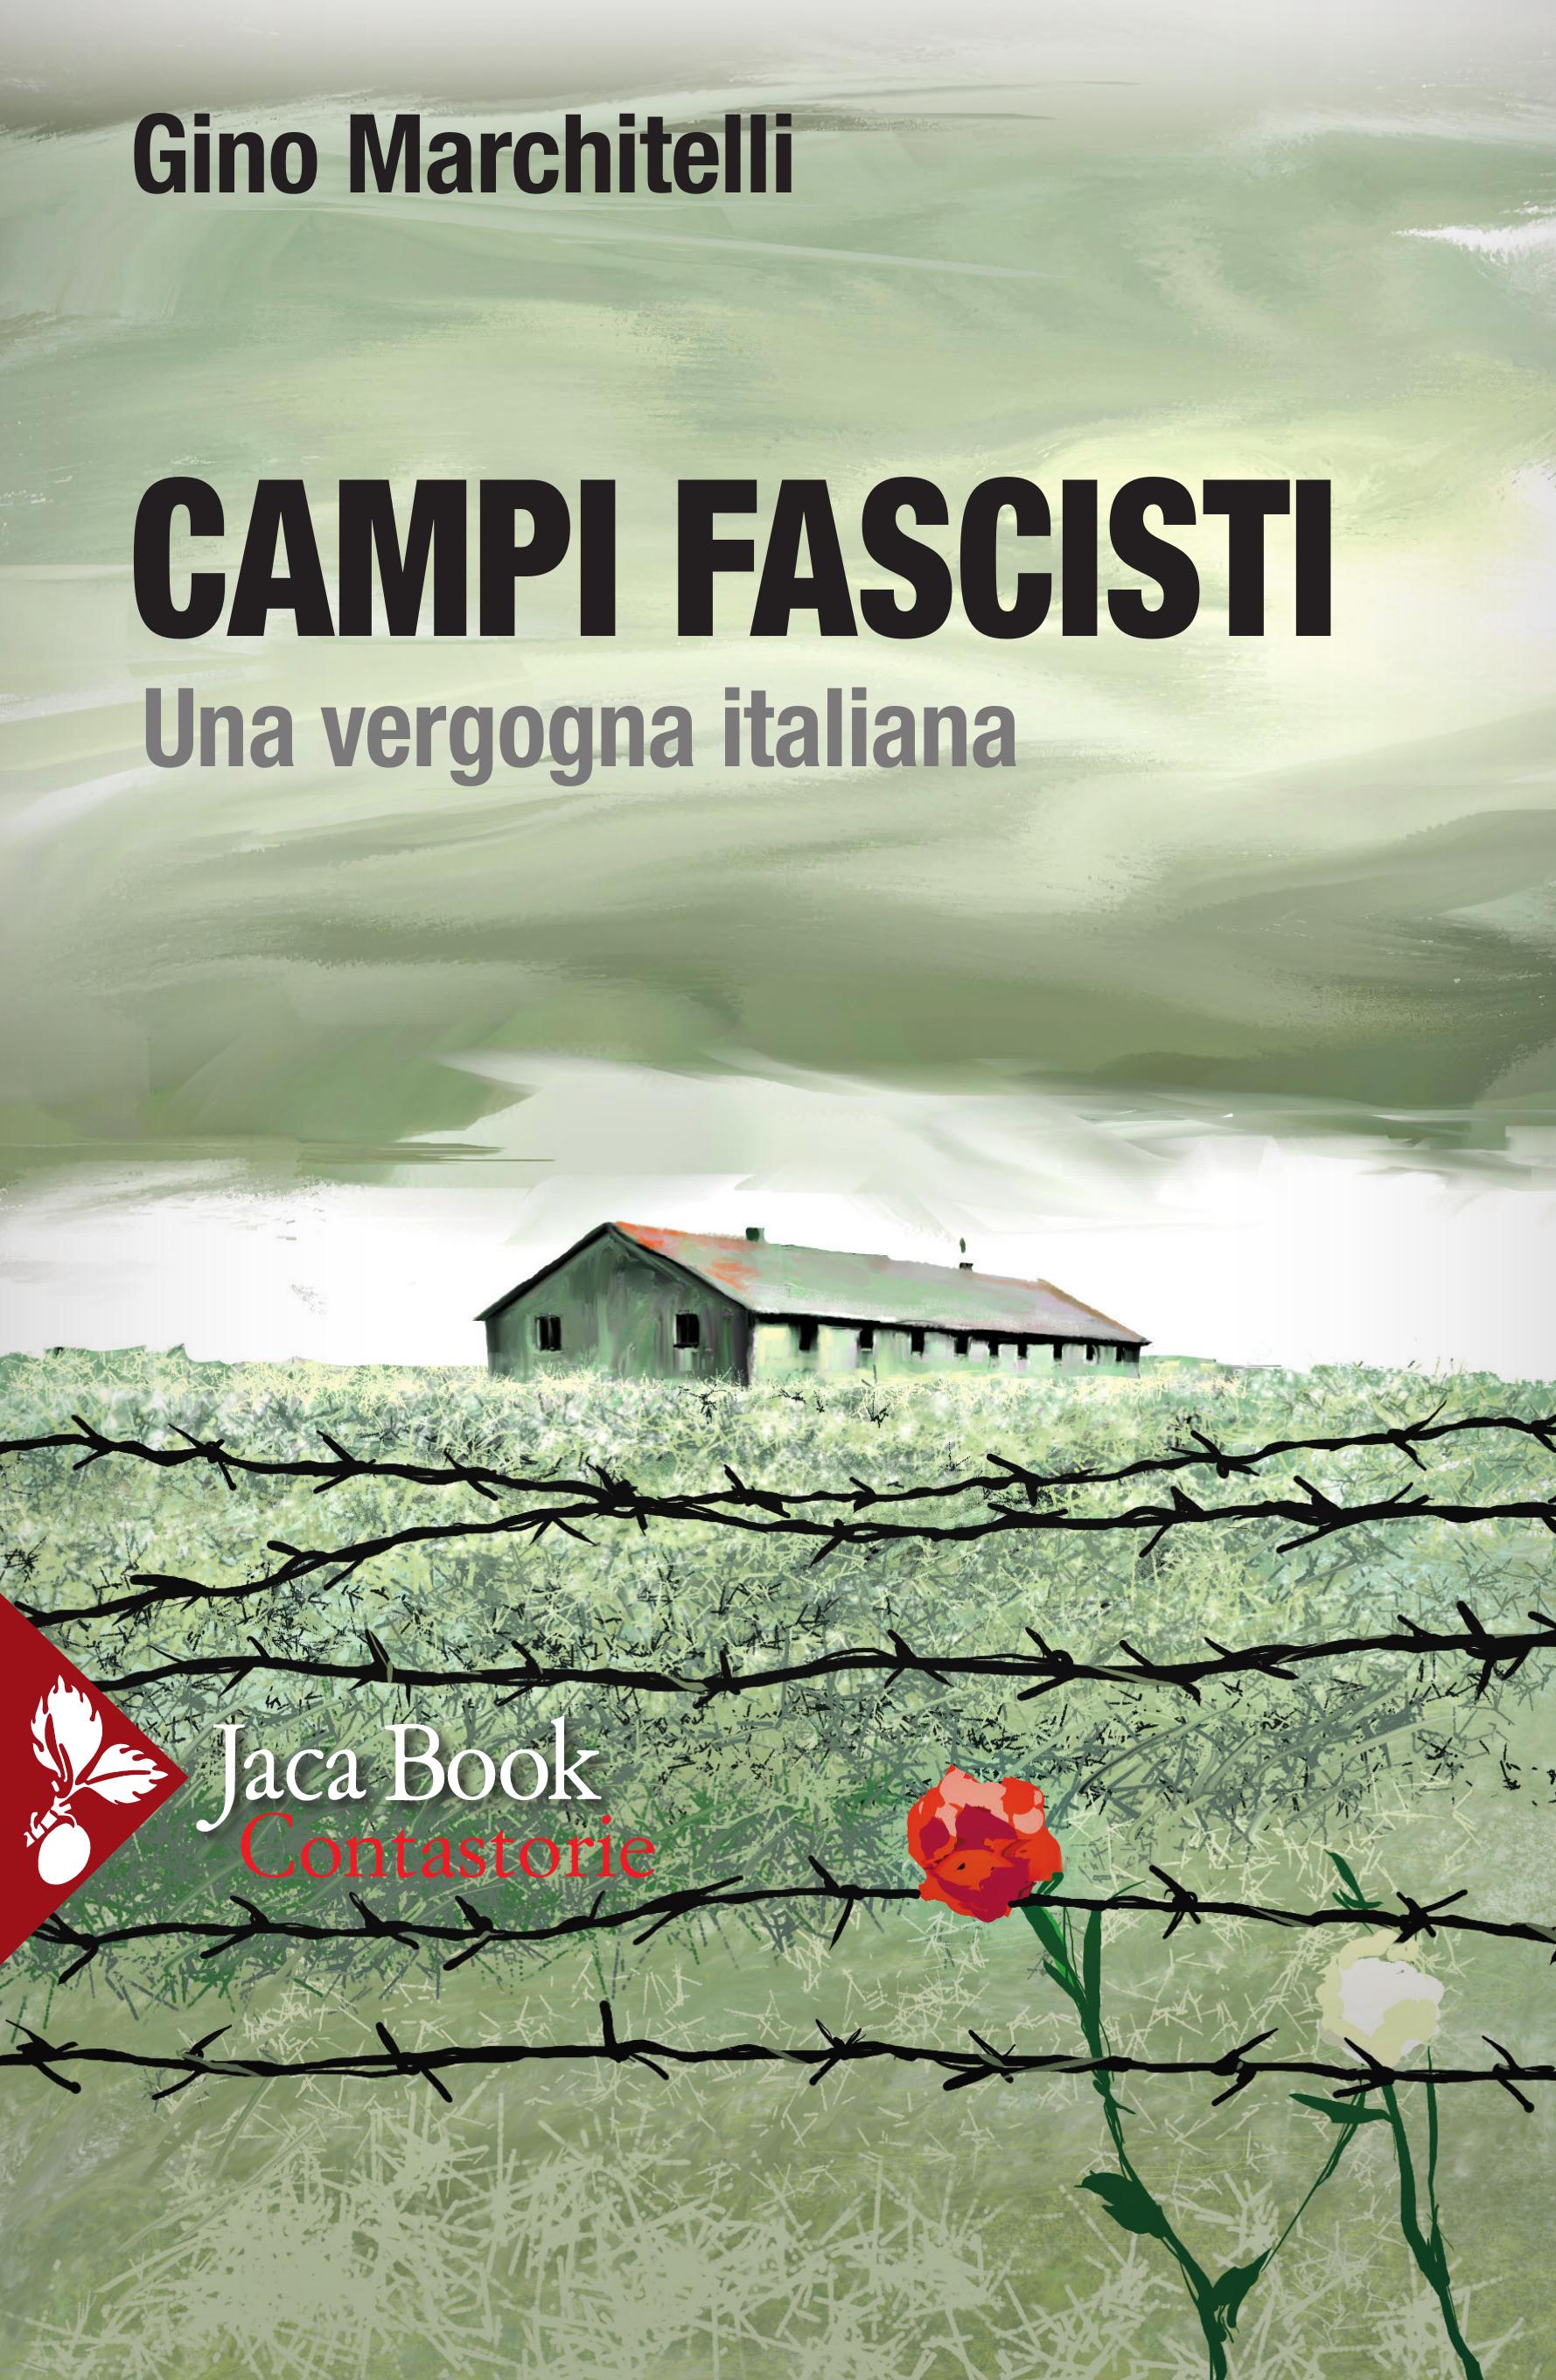 FASCIST CAMPS. An Italian shame